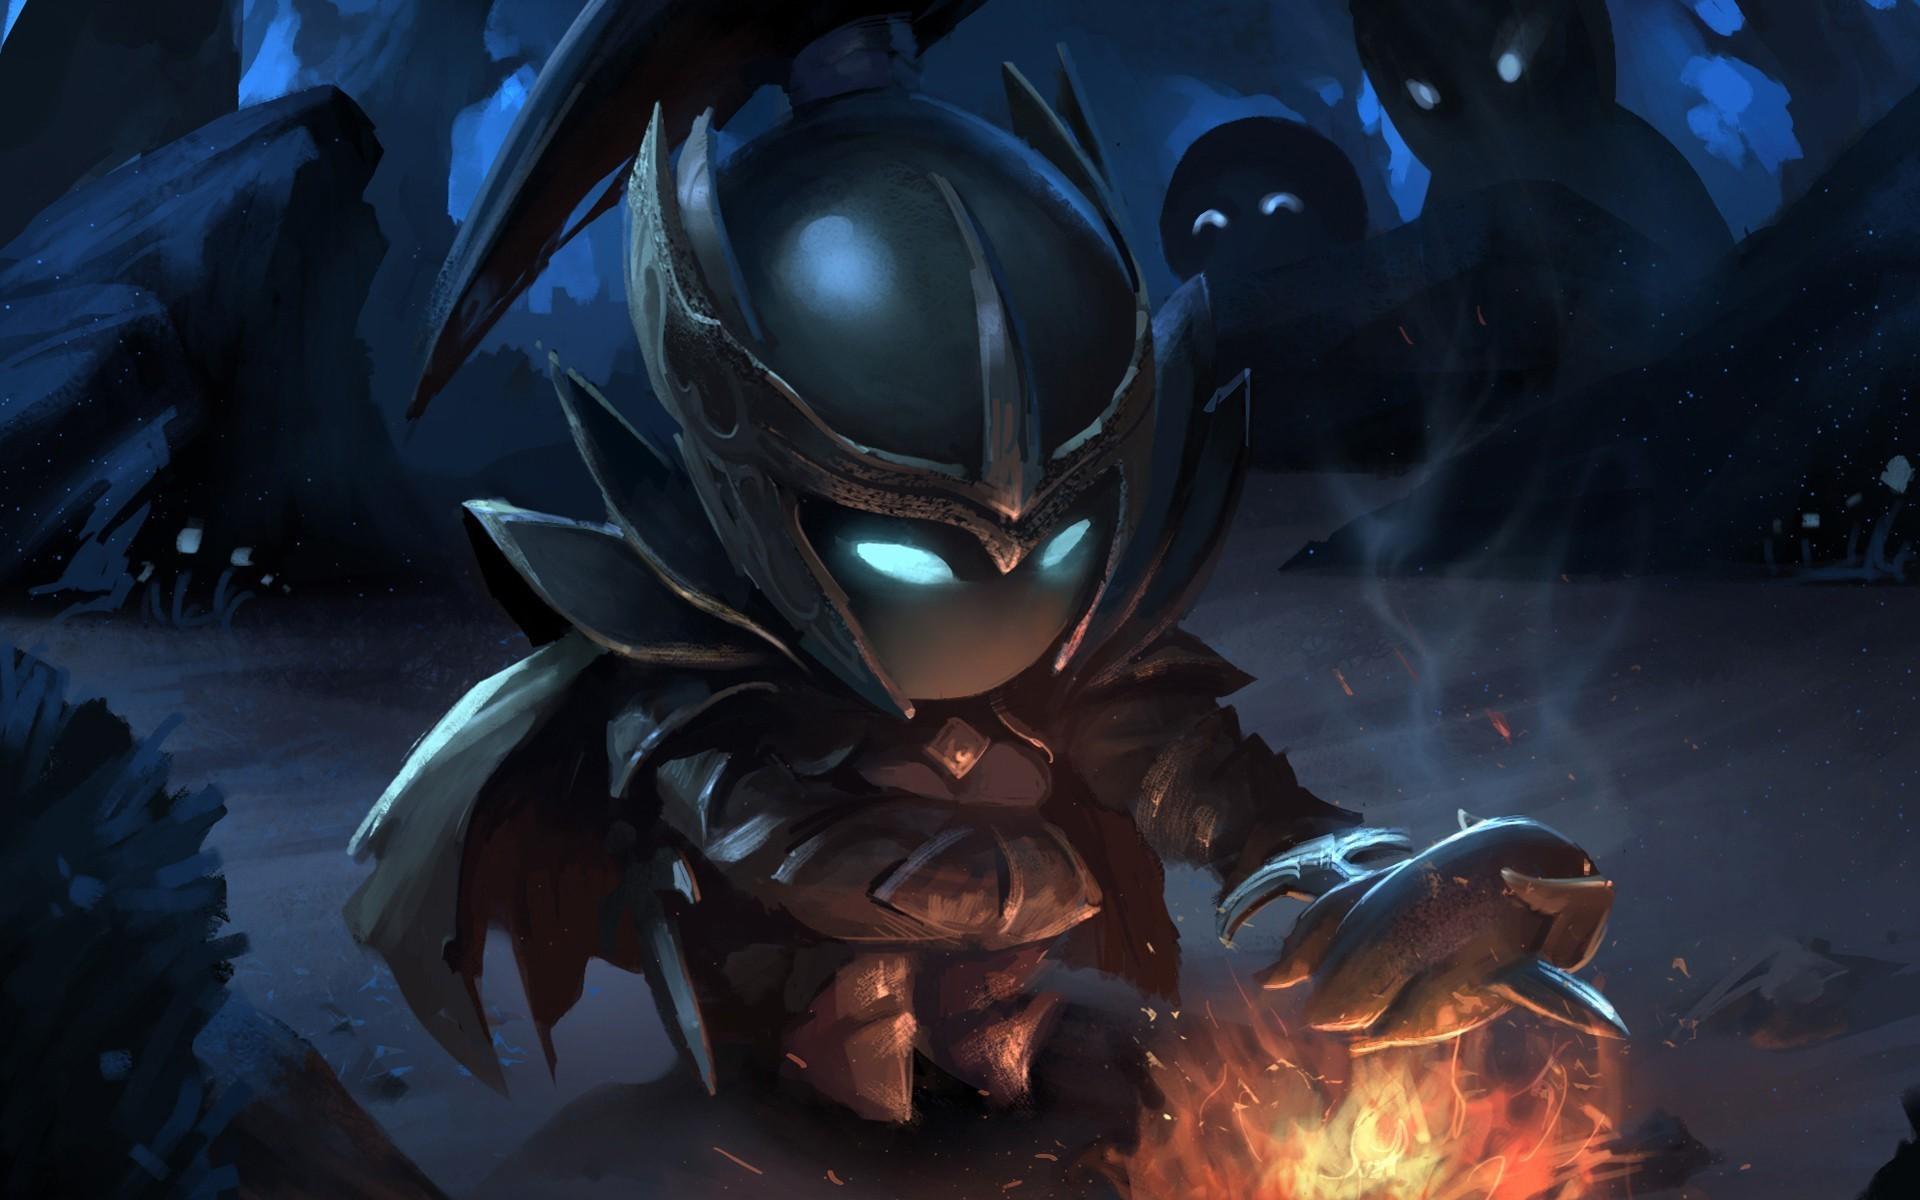 Dota 2 Dota Defense Of The Ancients Valve Valve Corporation Dota